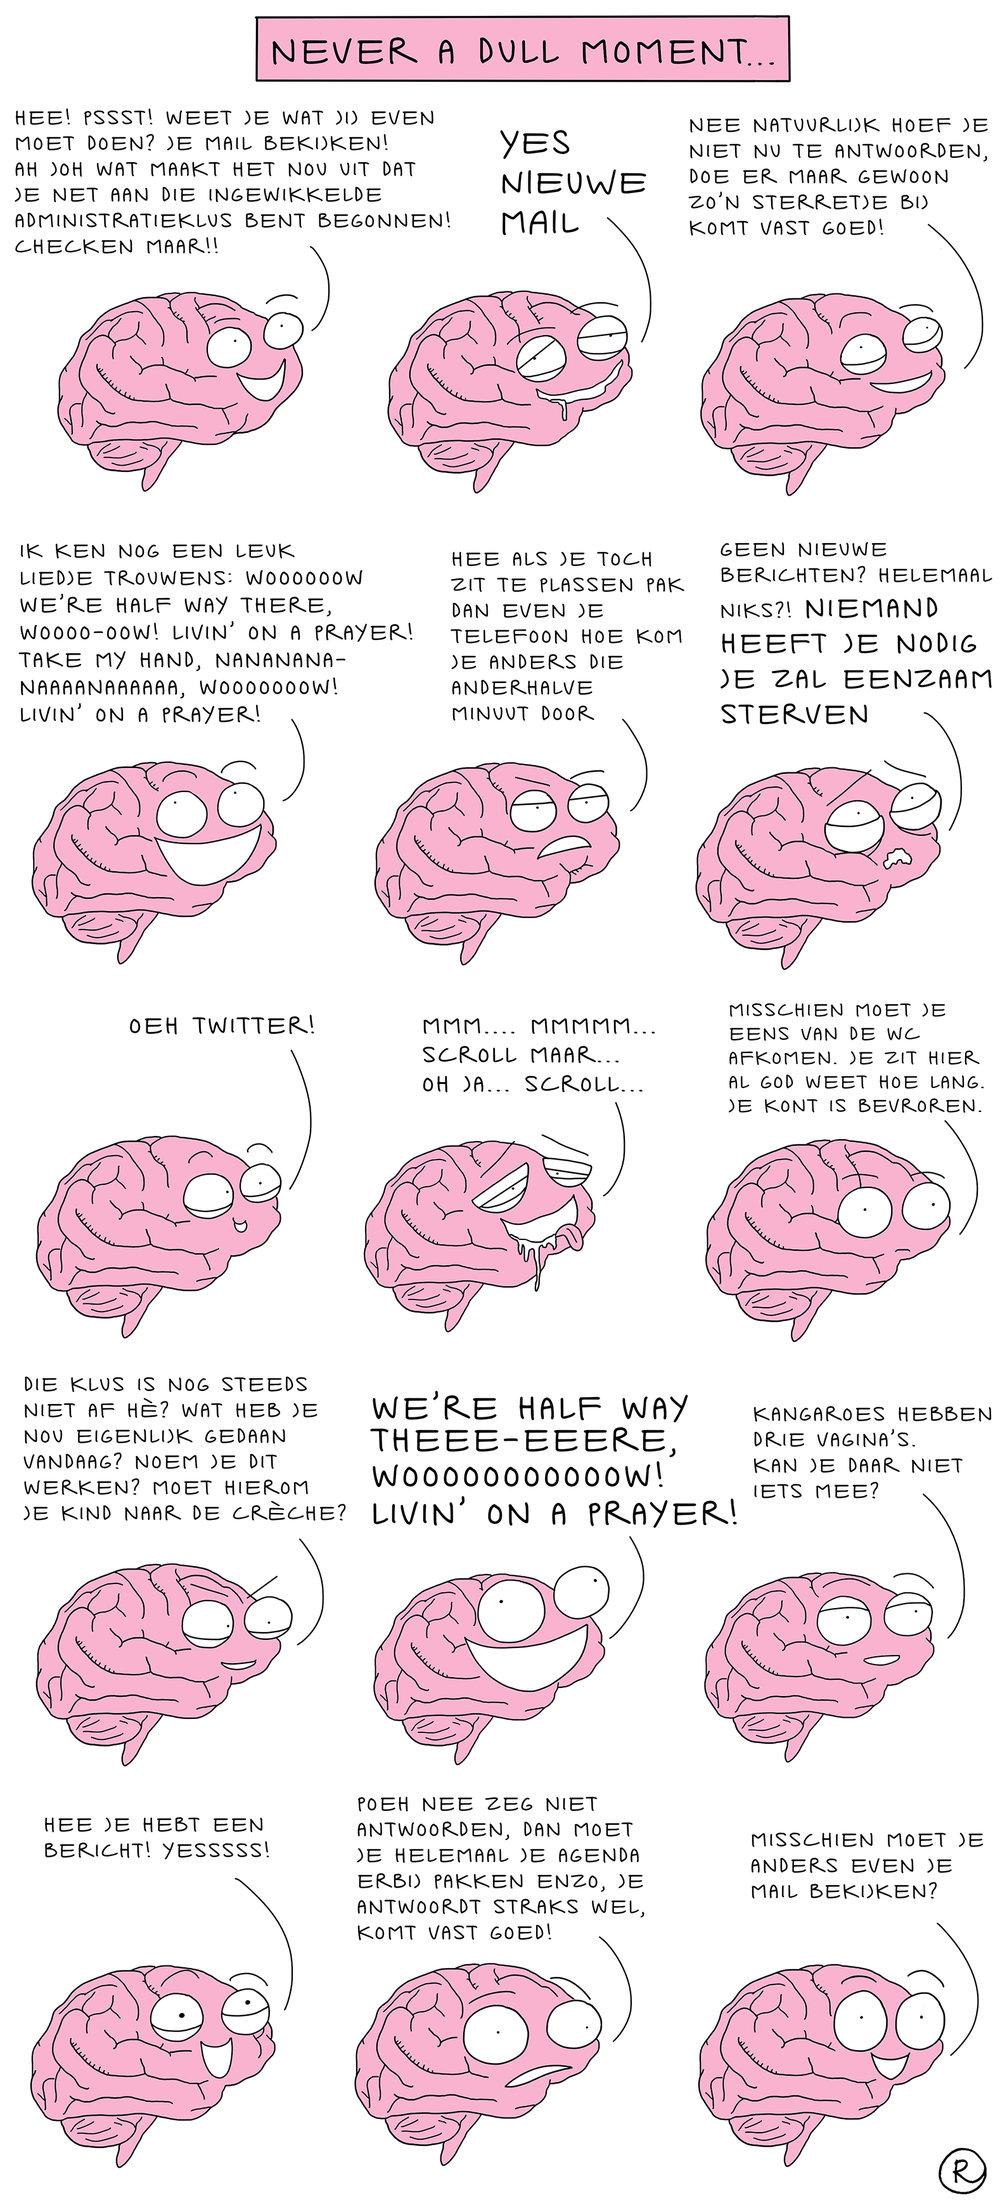 hersenen stem online.jpg